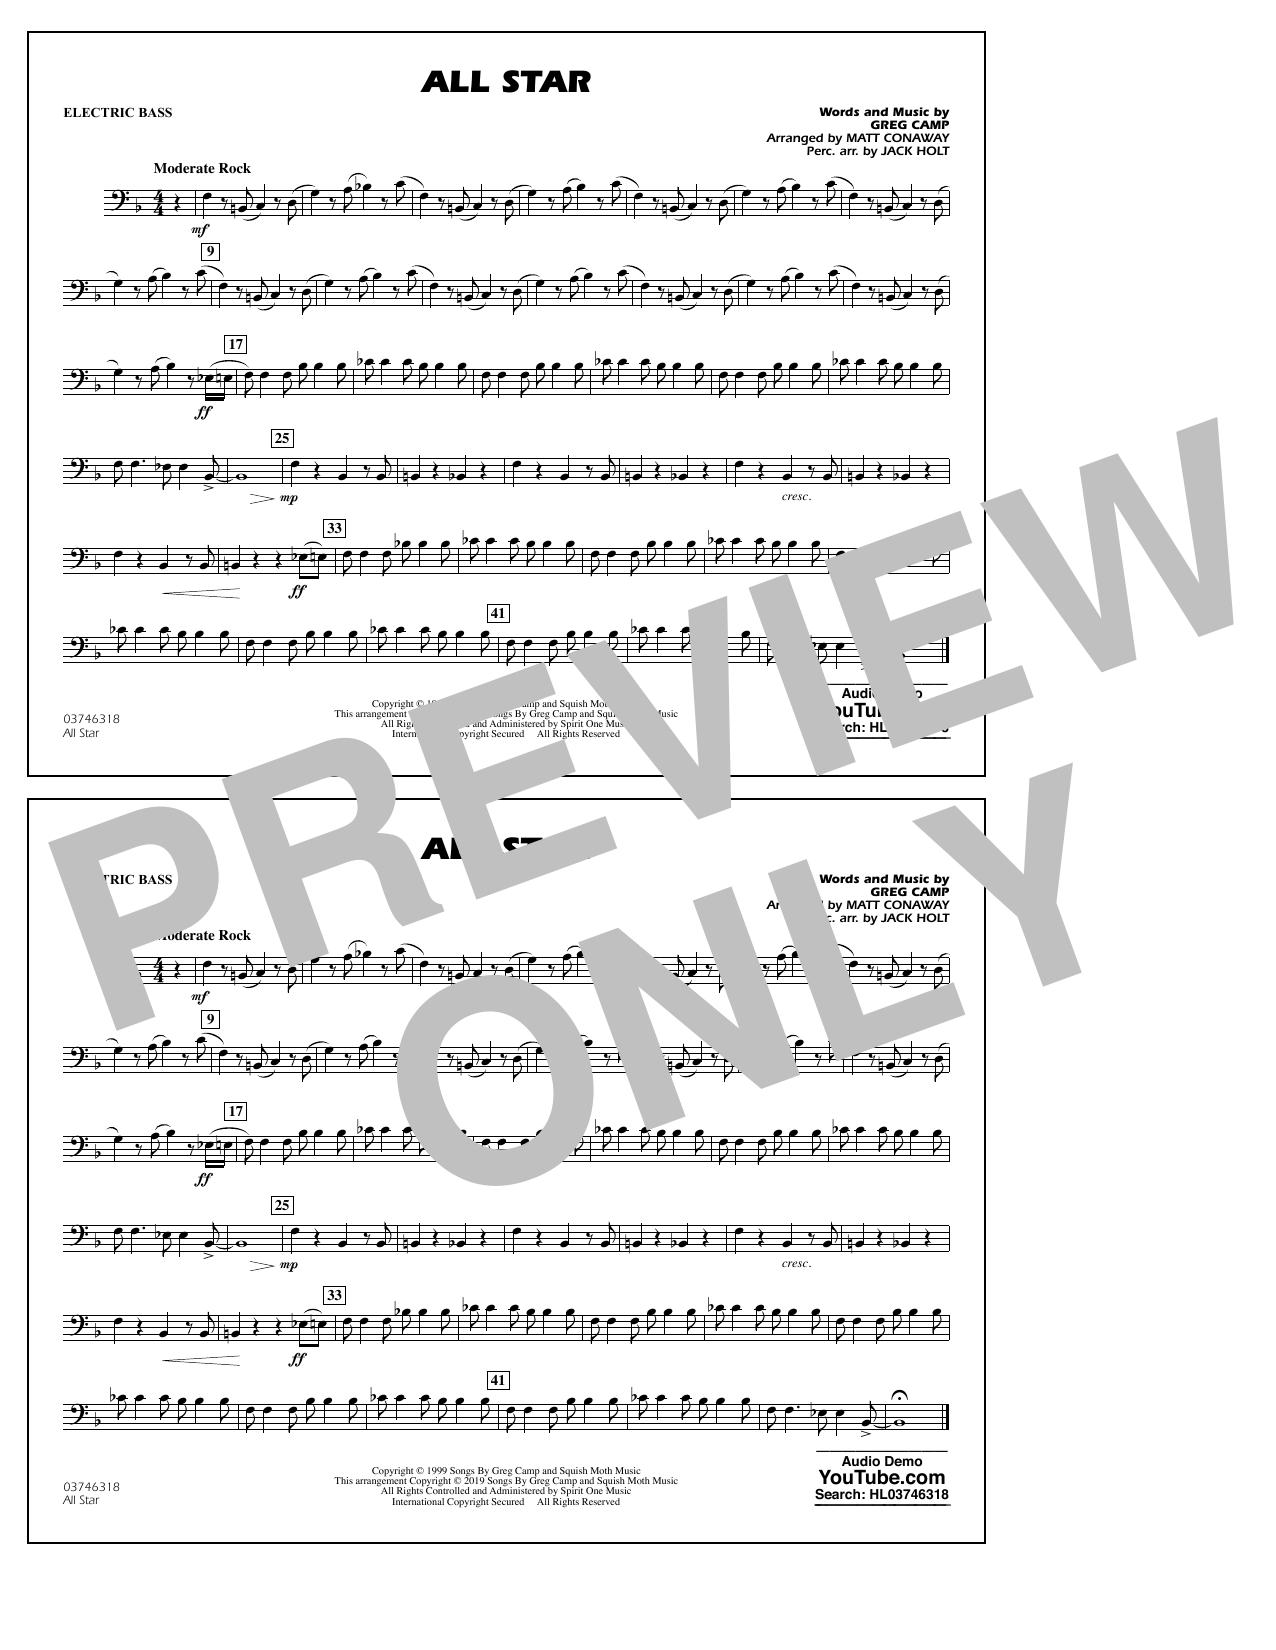 All Star (arr. Matt Conaway) - Electric Bass (Marching Band)